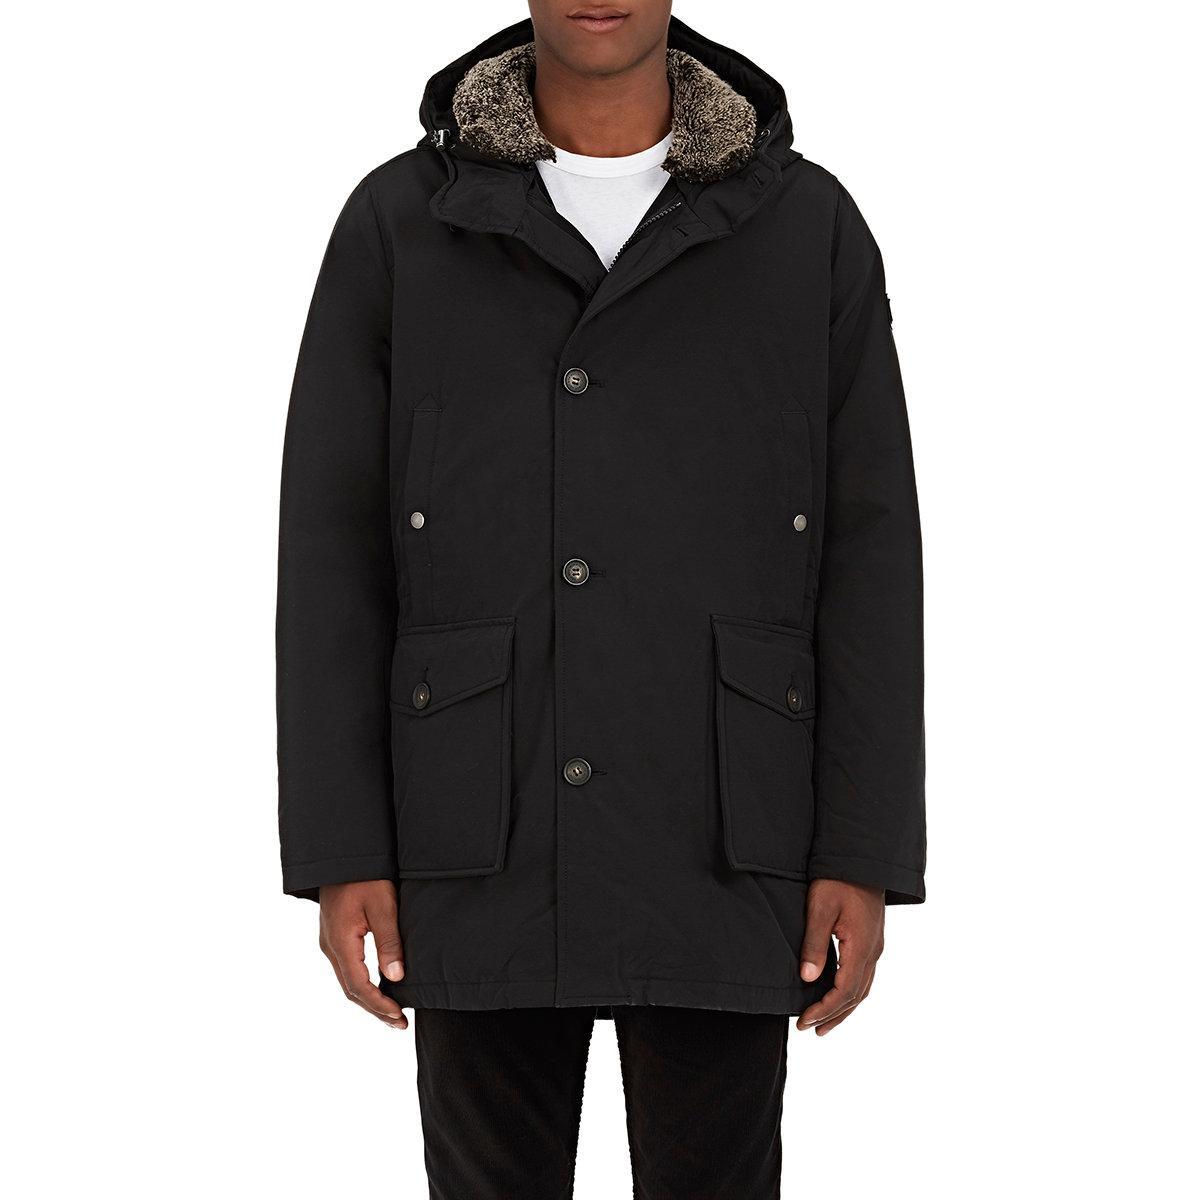 Woolrich Mackinaw Faille Down Parka In Black For Men Lyst